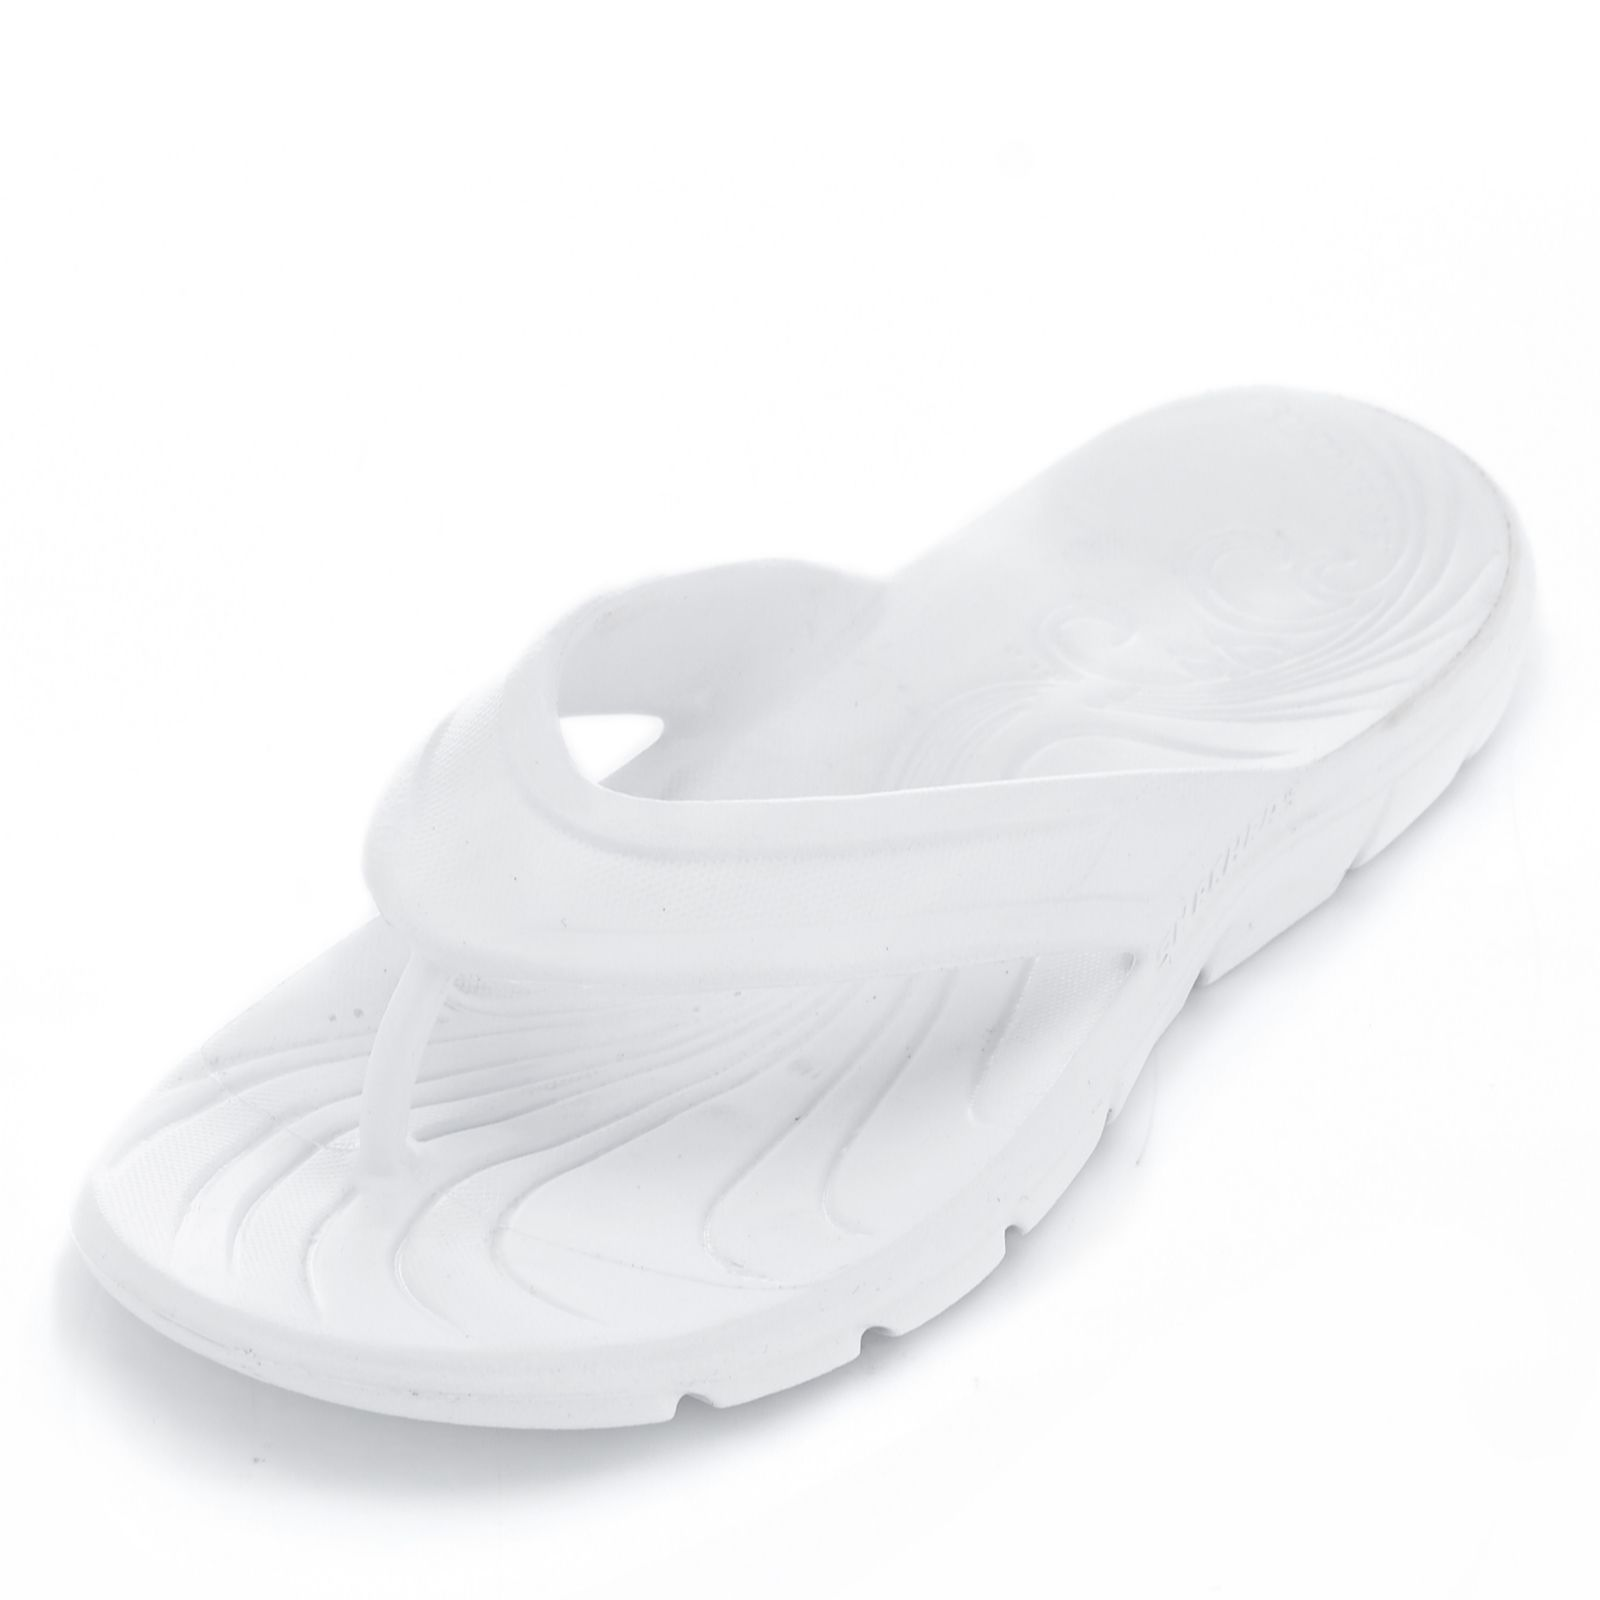 qvc skechers flip flops